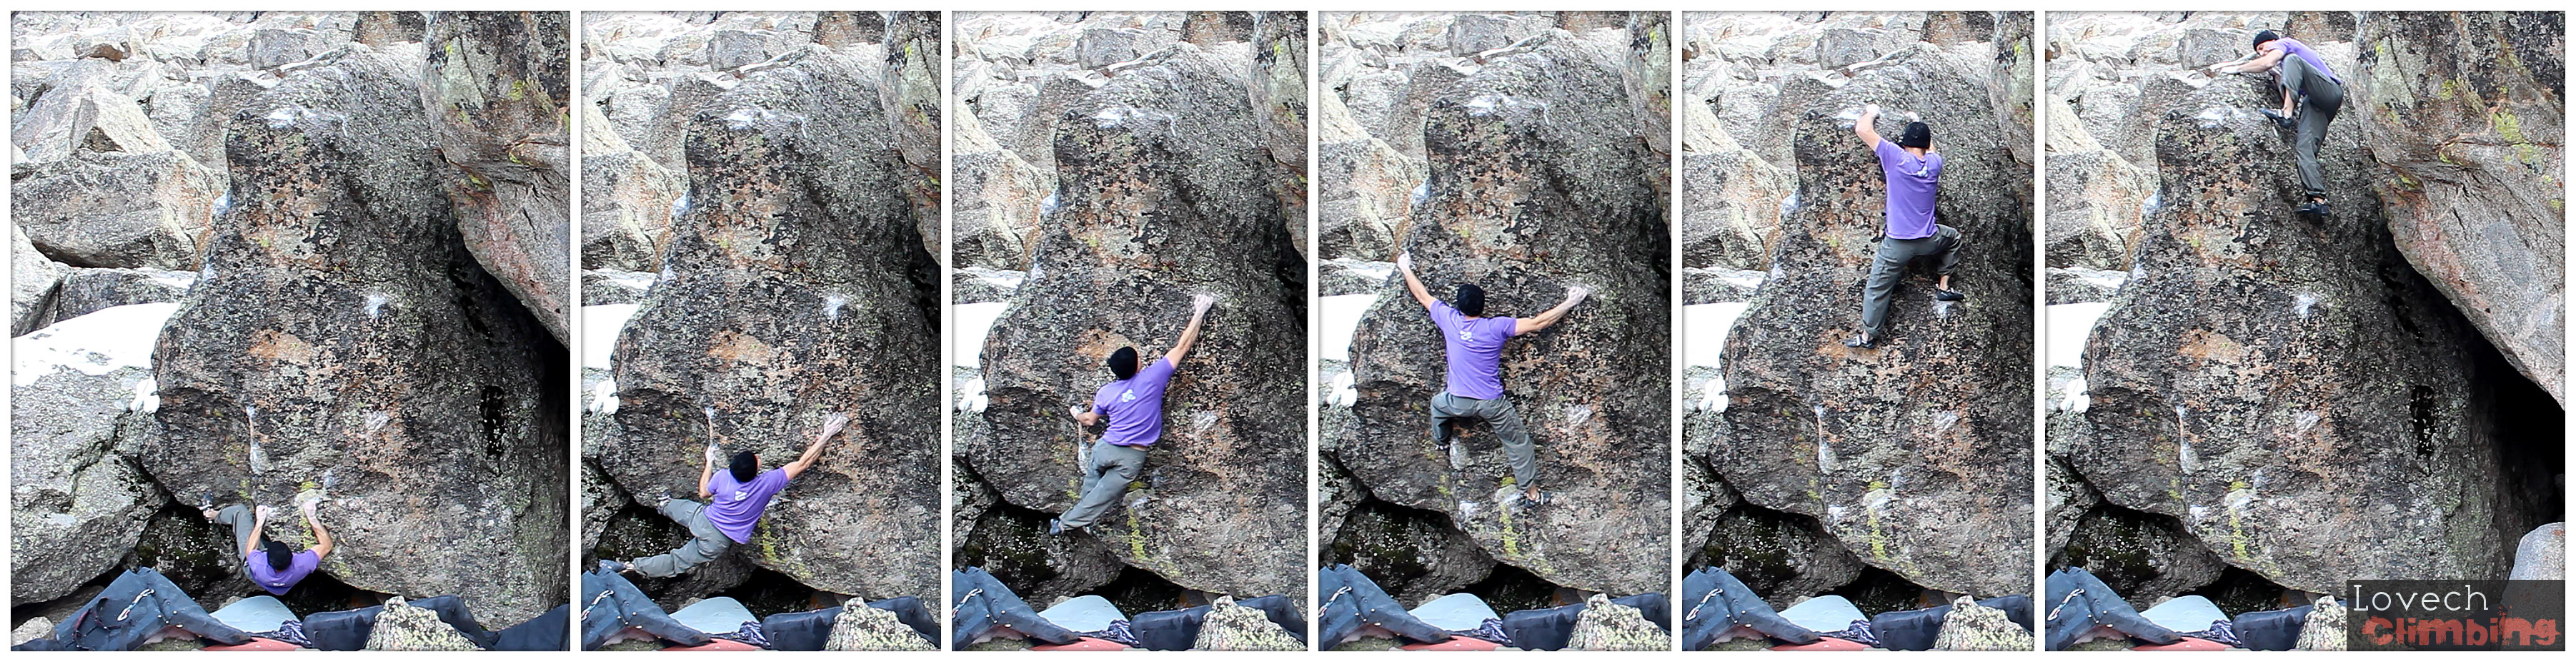 "Ivelin Penchev on ""Stingray"" V10 FA Area B Mt Evans 2014"